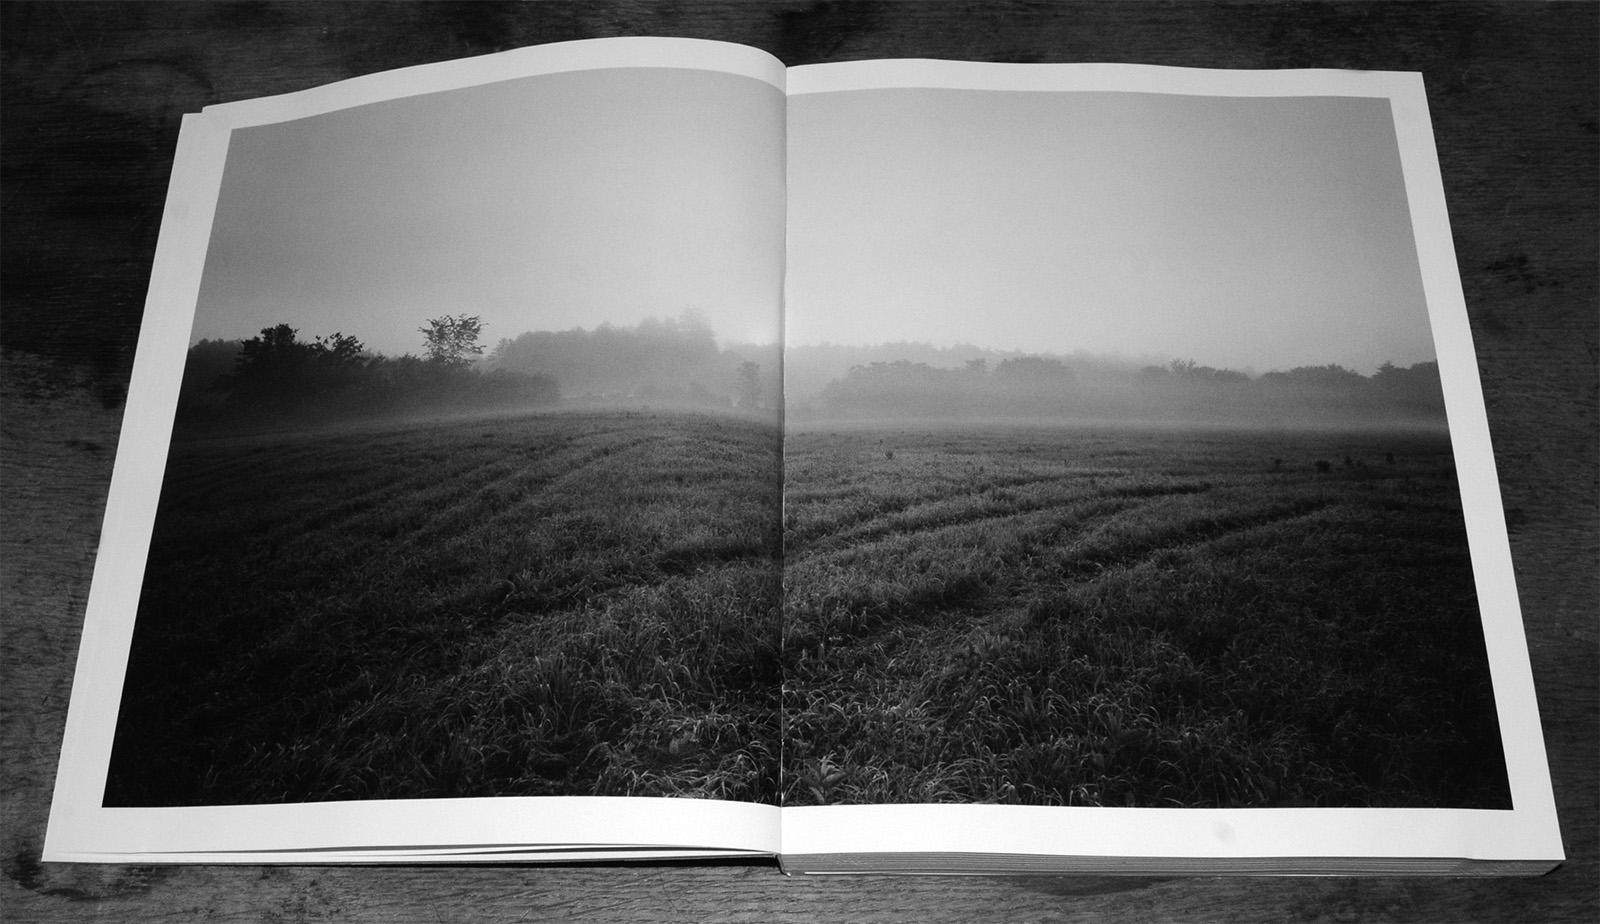 Barbara Bosworth & Margot Anne Kelley's The Meadow